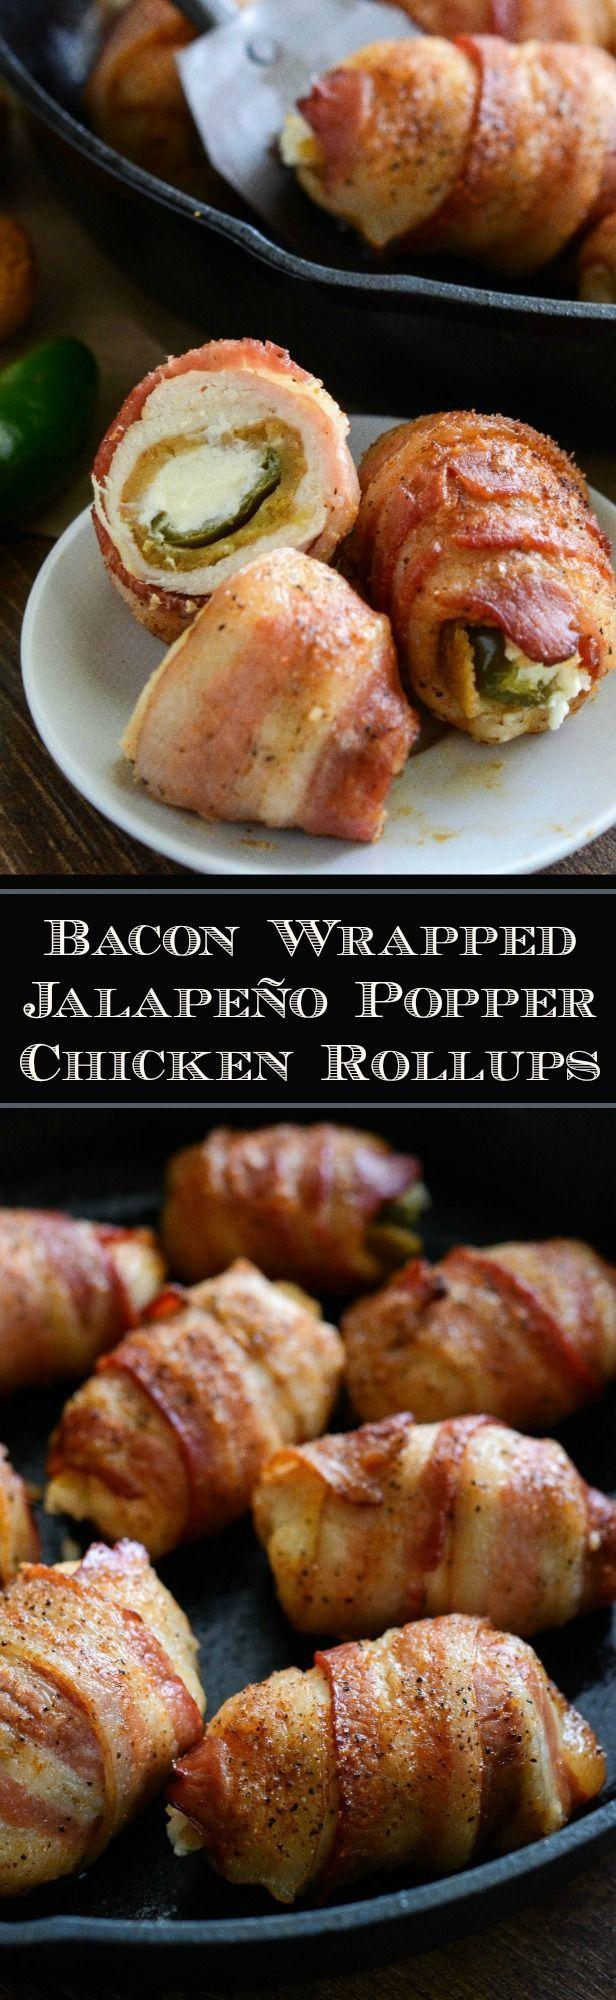 Bacon Wrapped Jalape�o Popper Stuffed Chicken Rollups